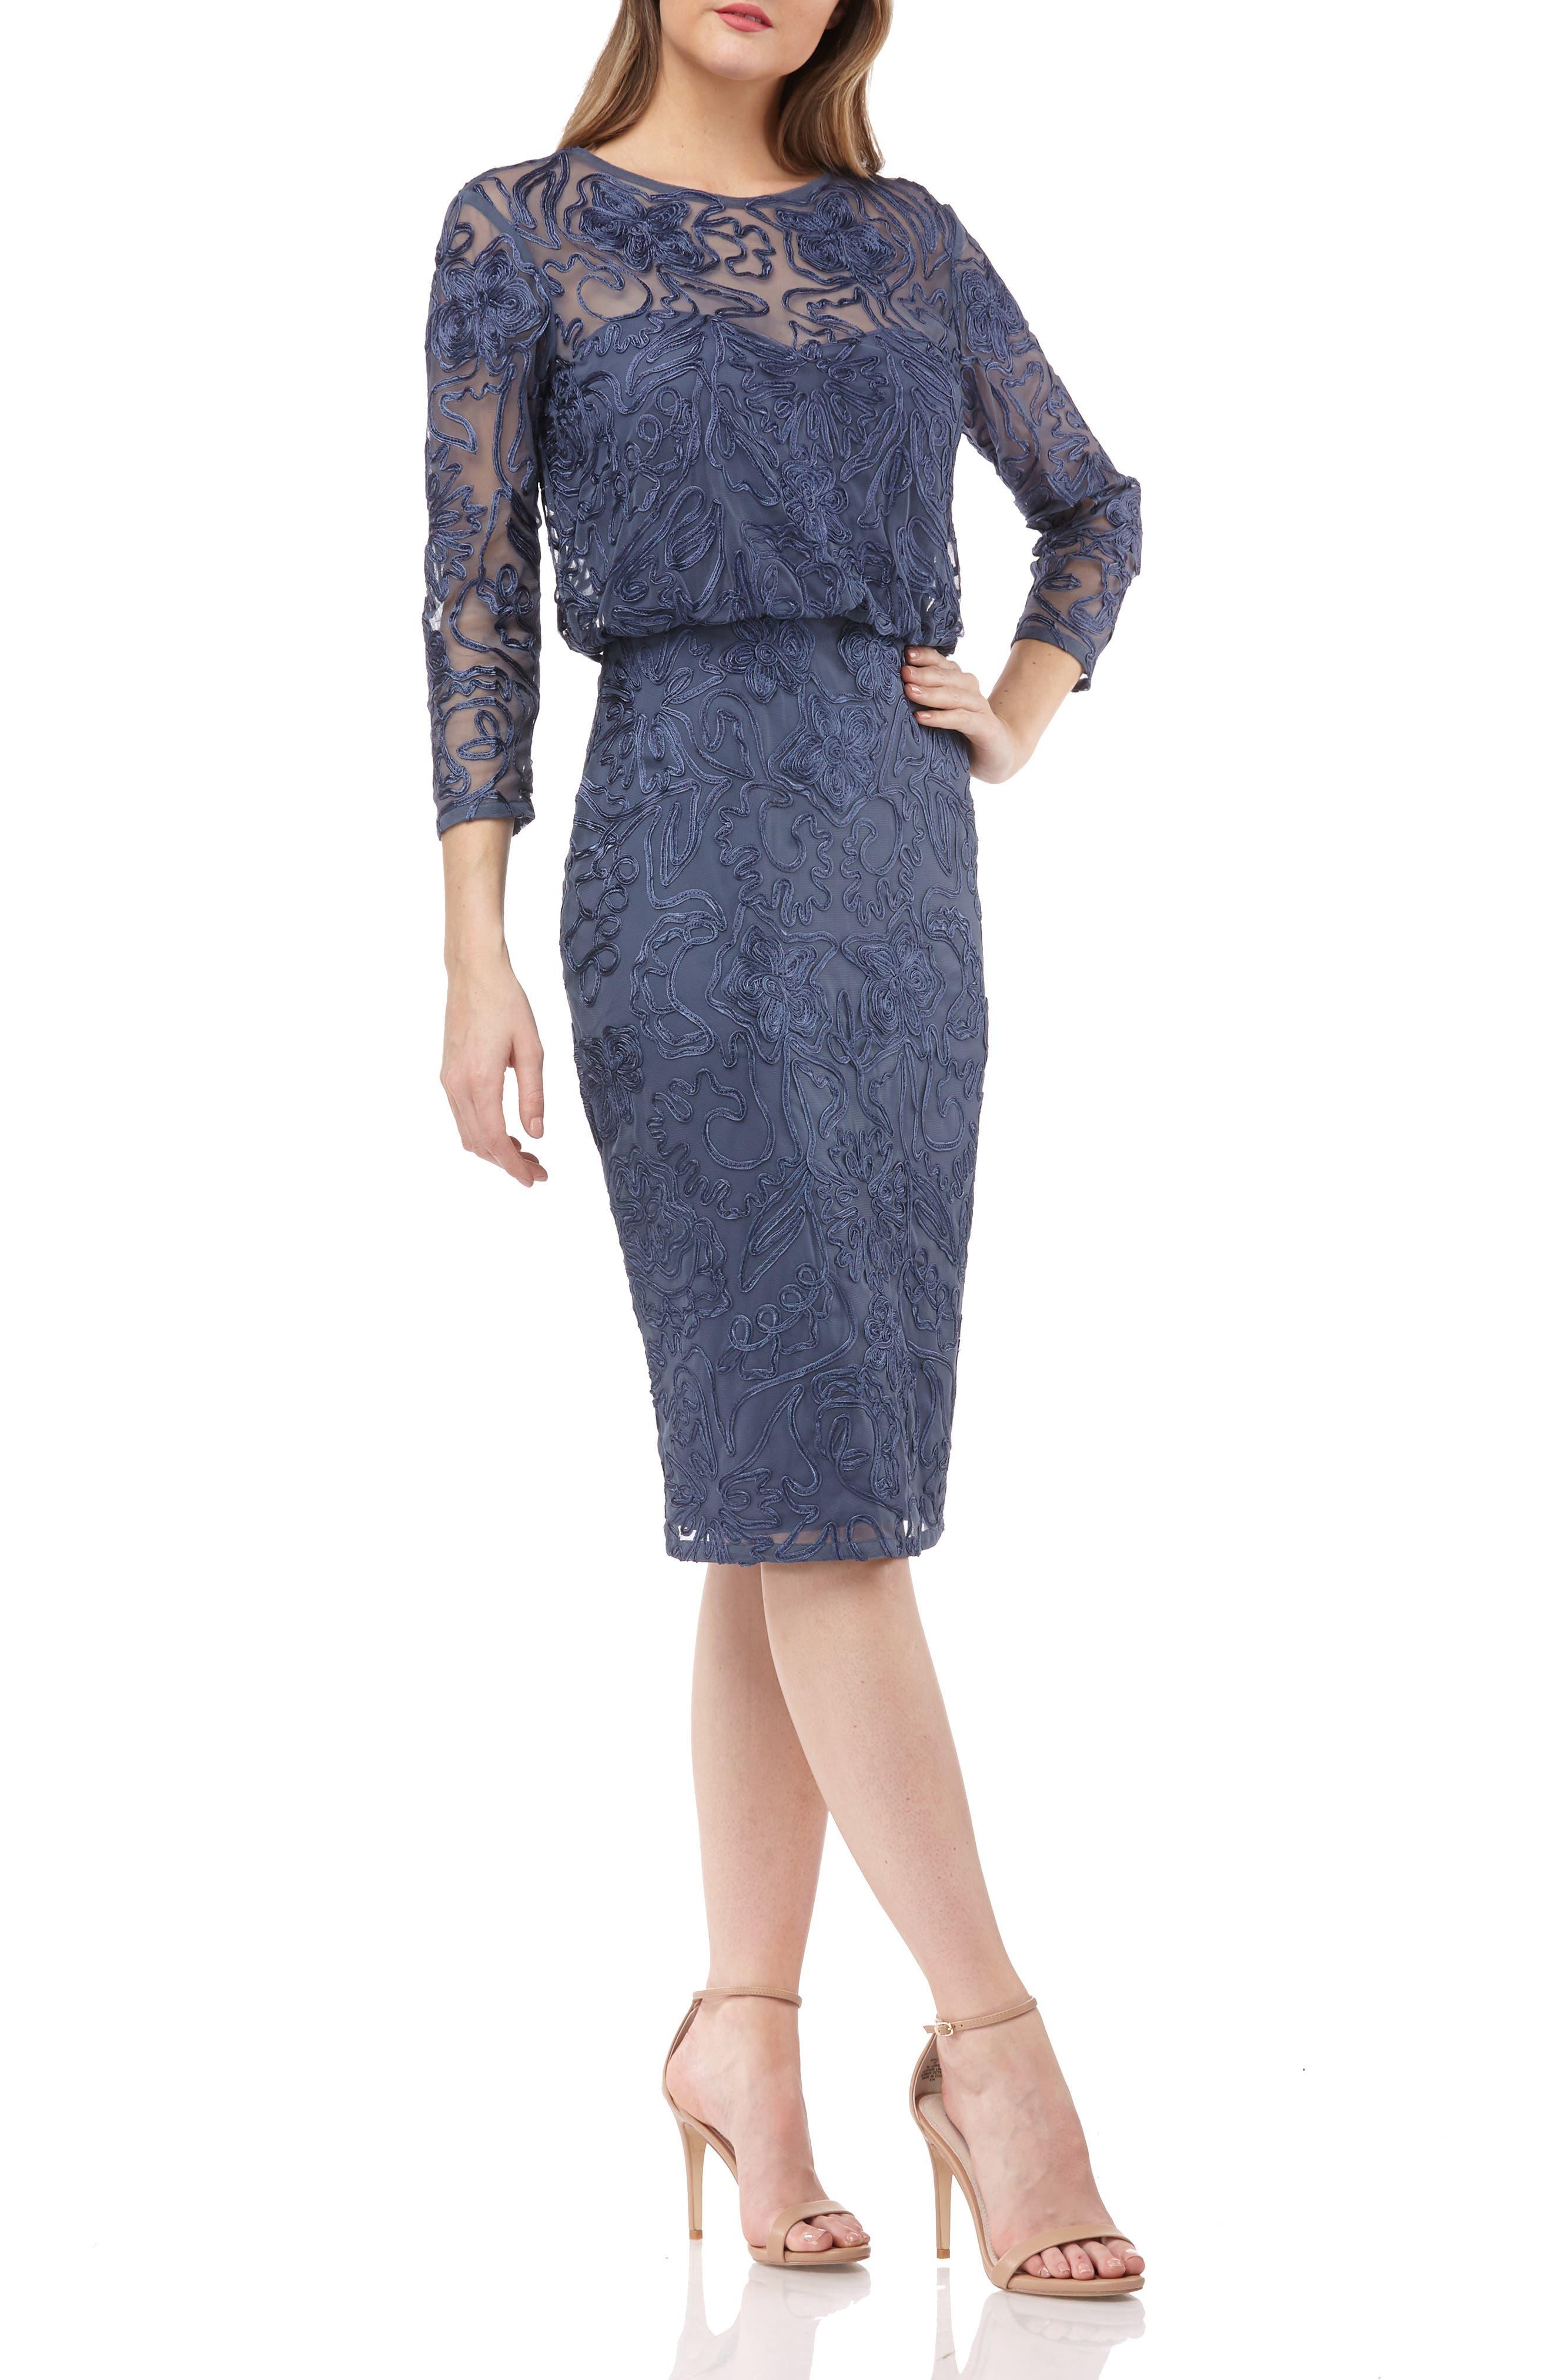 Js Collections Soutache Embroidered Blouson Dress